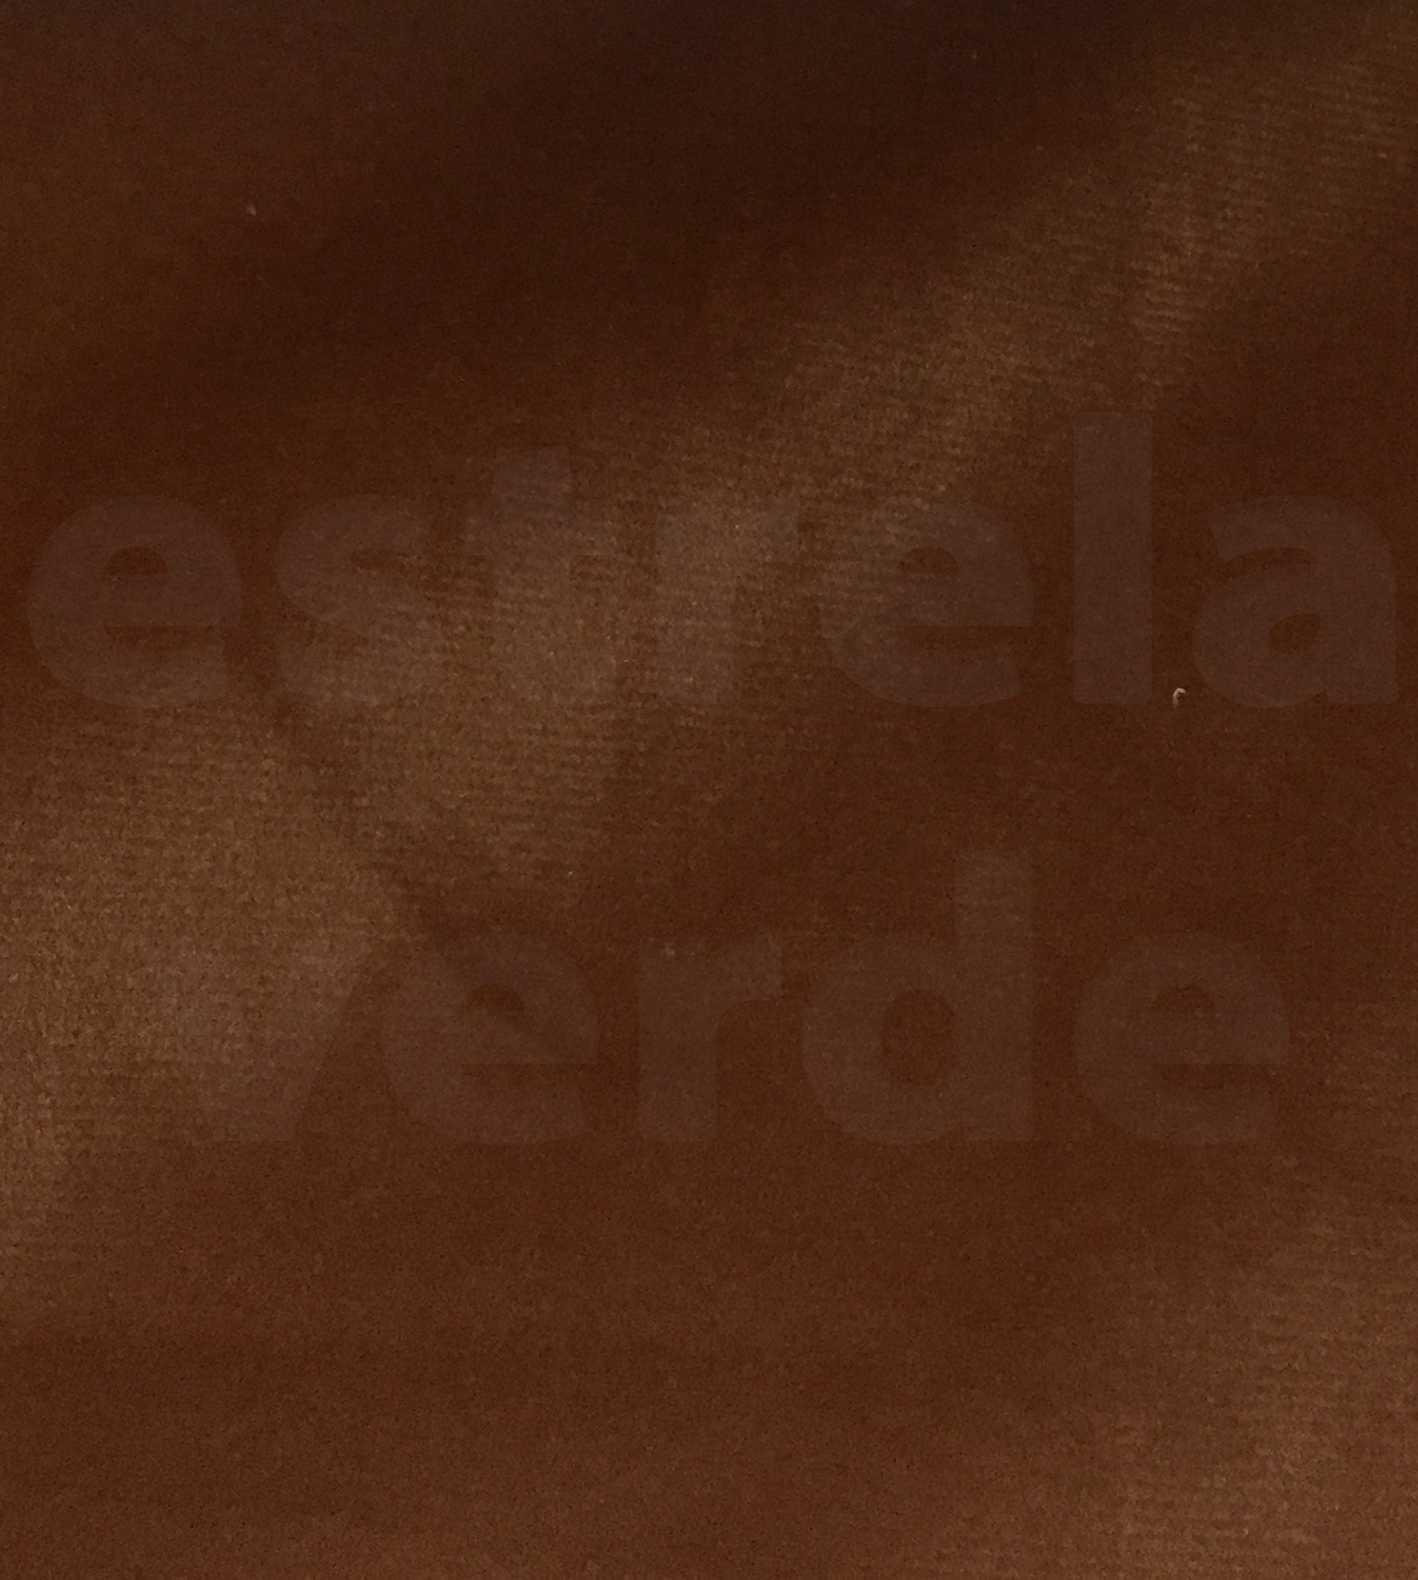 VELUDO TERRA COTA 402  - Estrela Verde